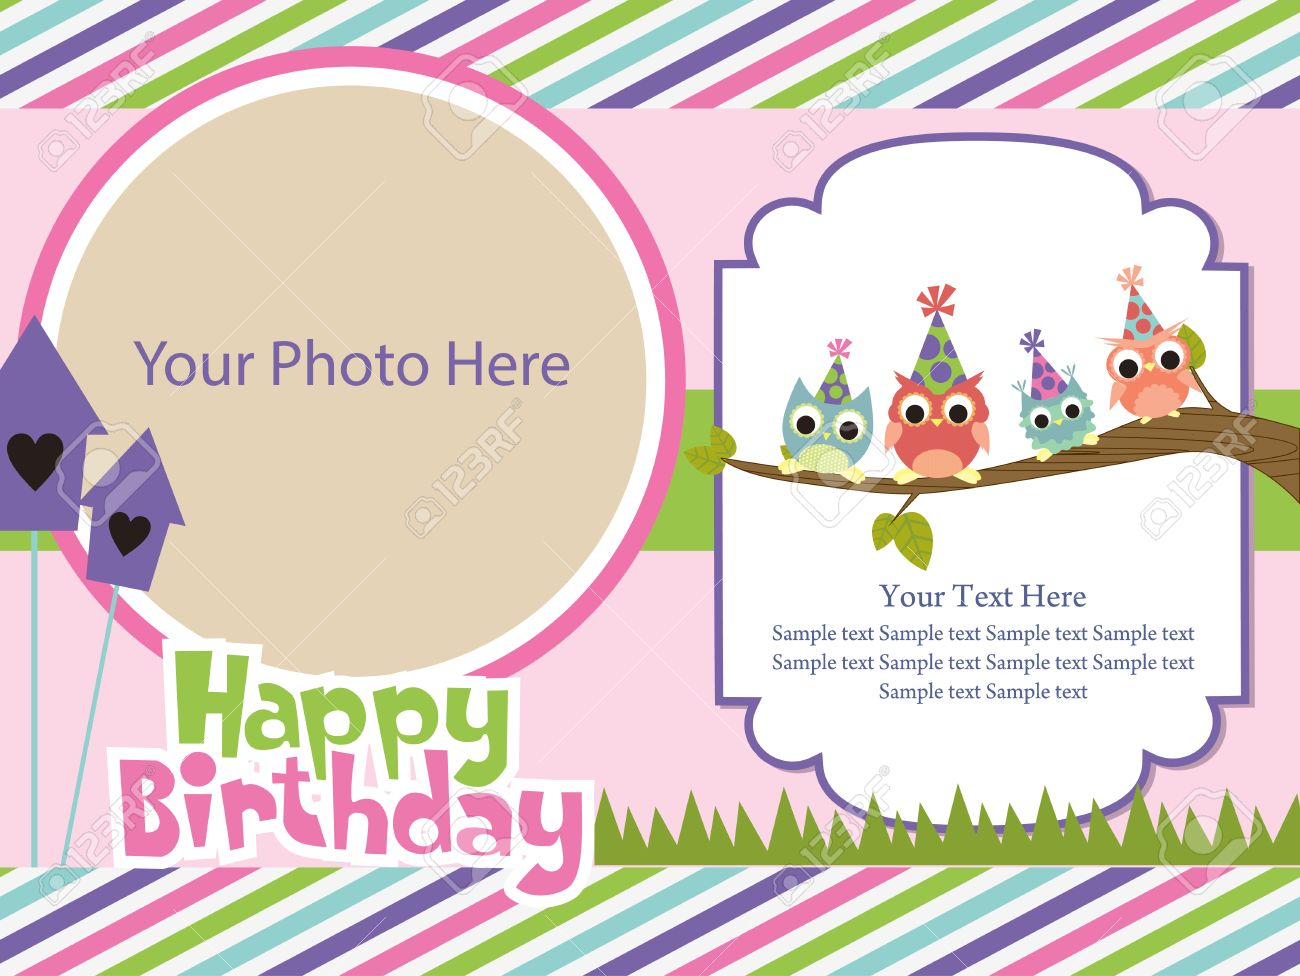 Happy Birthday Invitation Card Design. Vector Illustration Royalty ...